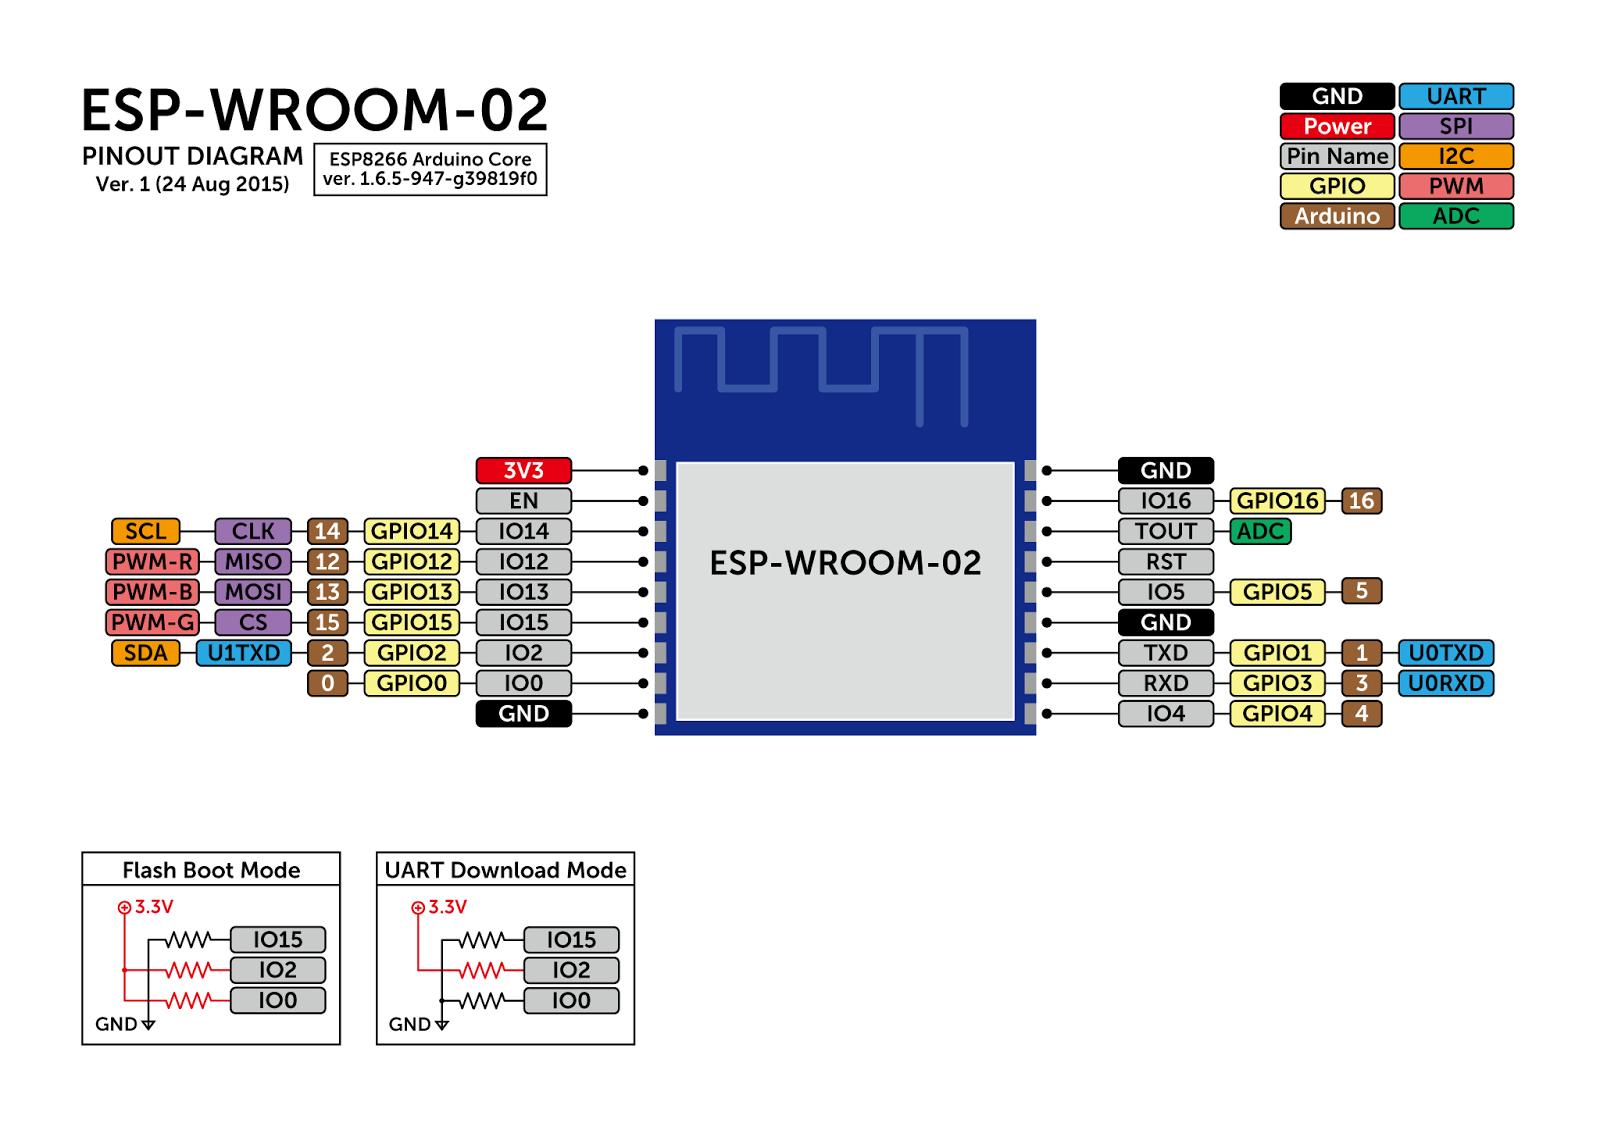 ESP-WROOM-02のピン対応表